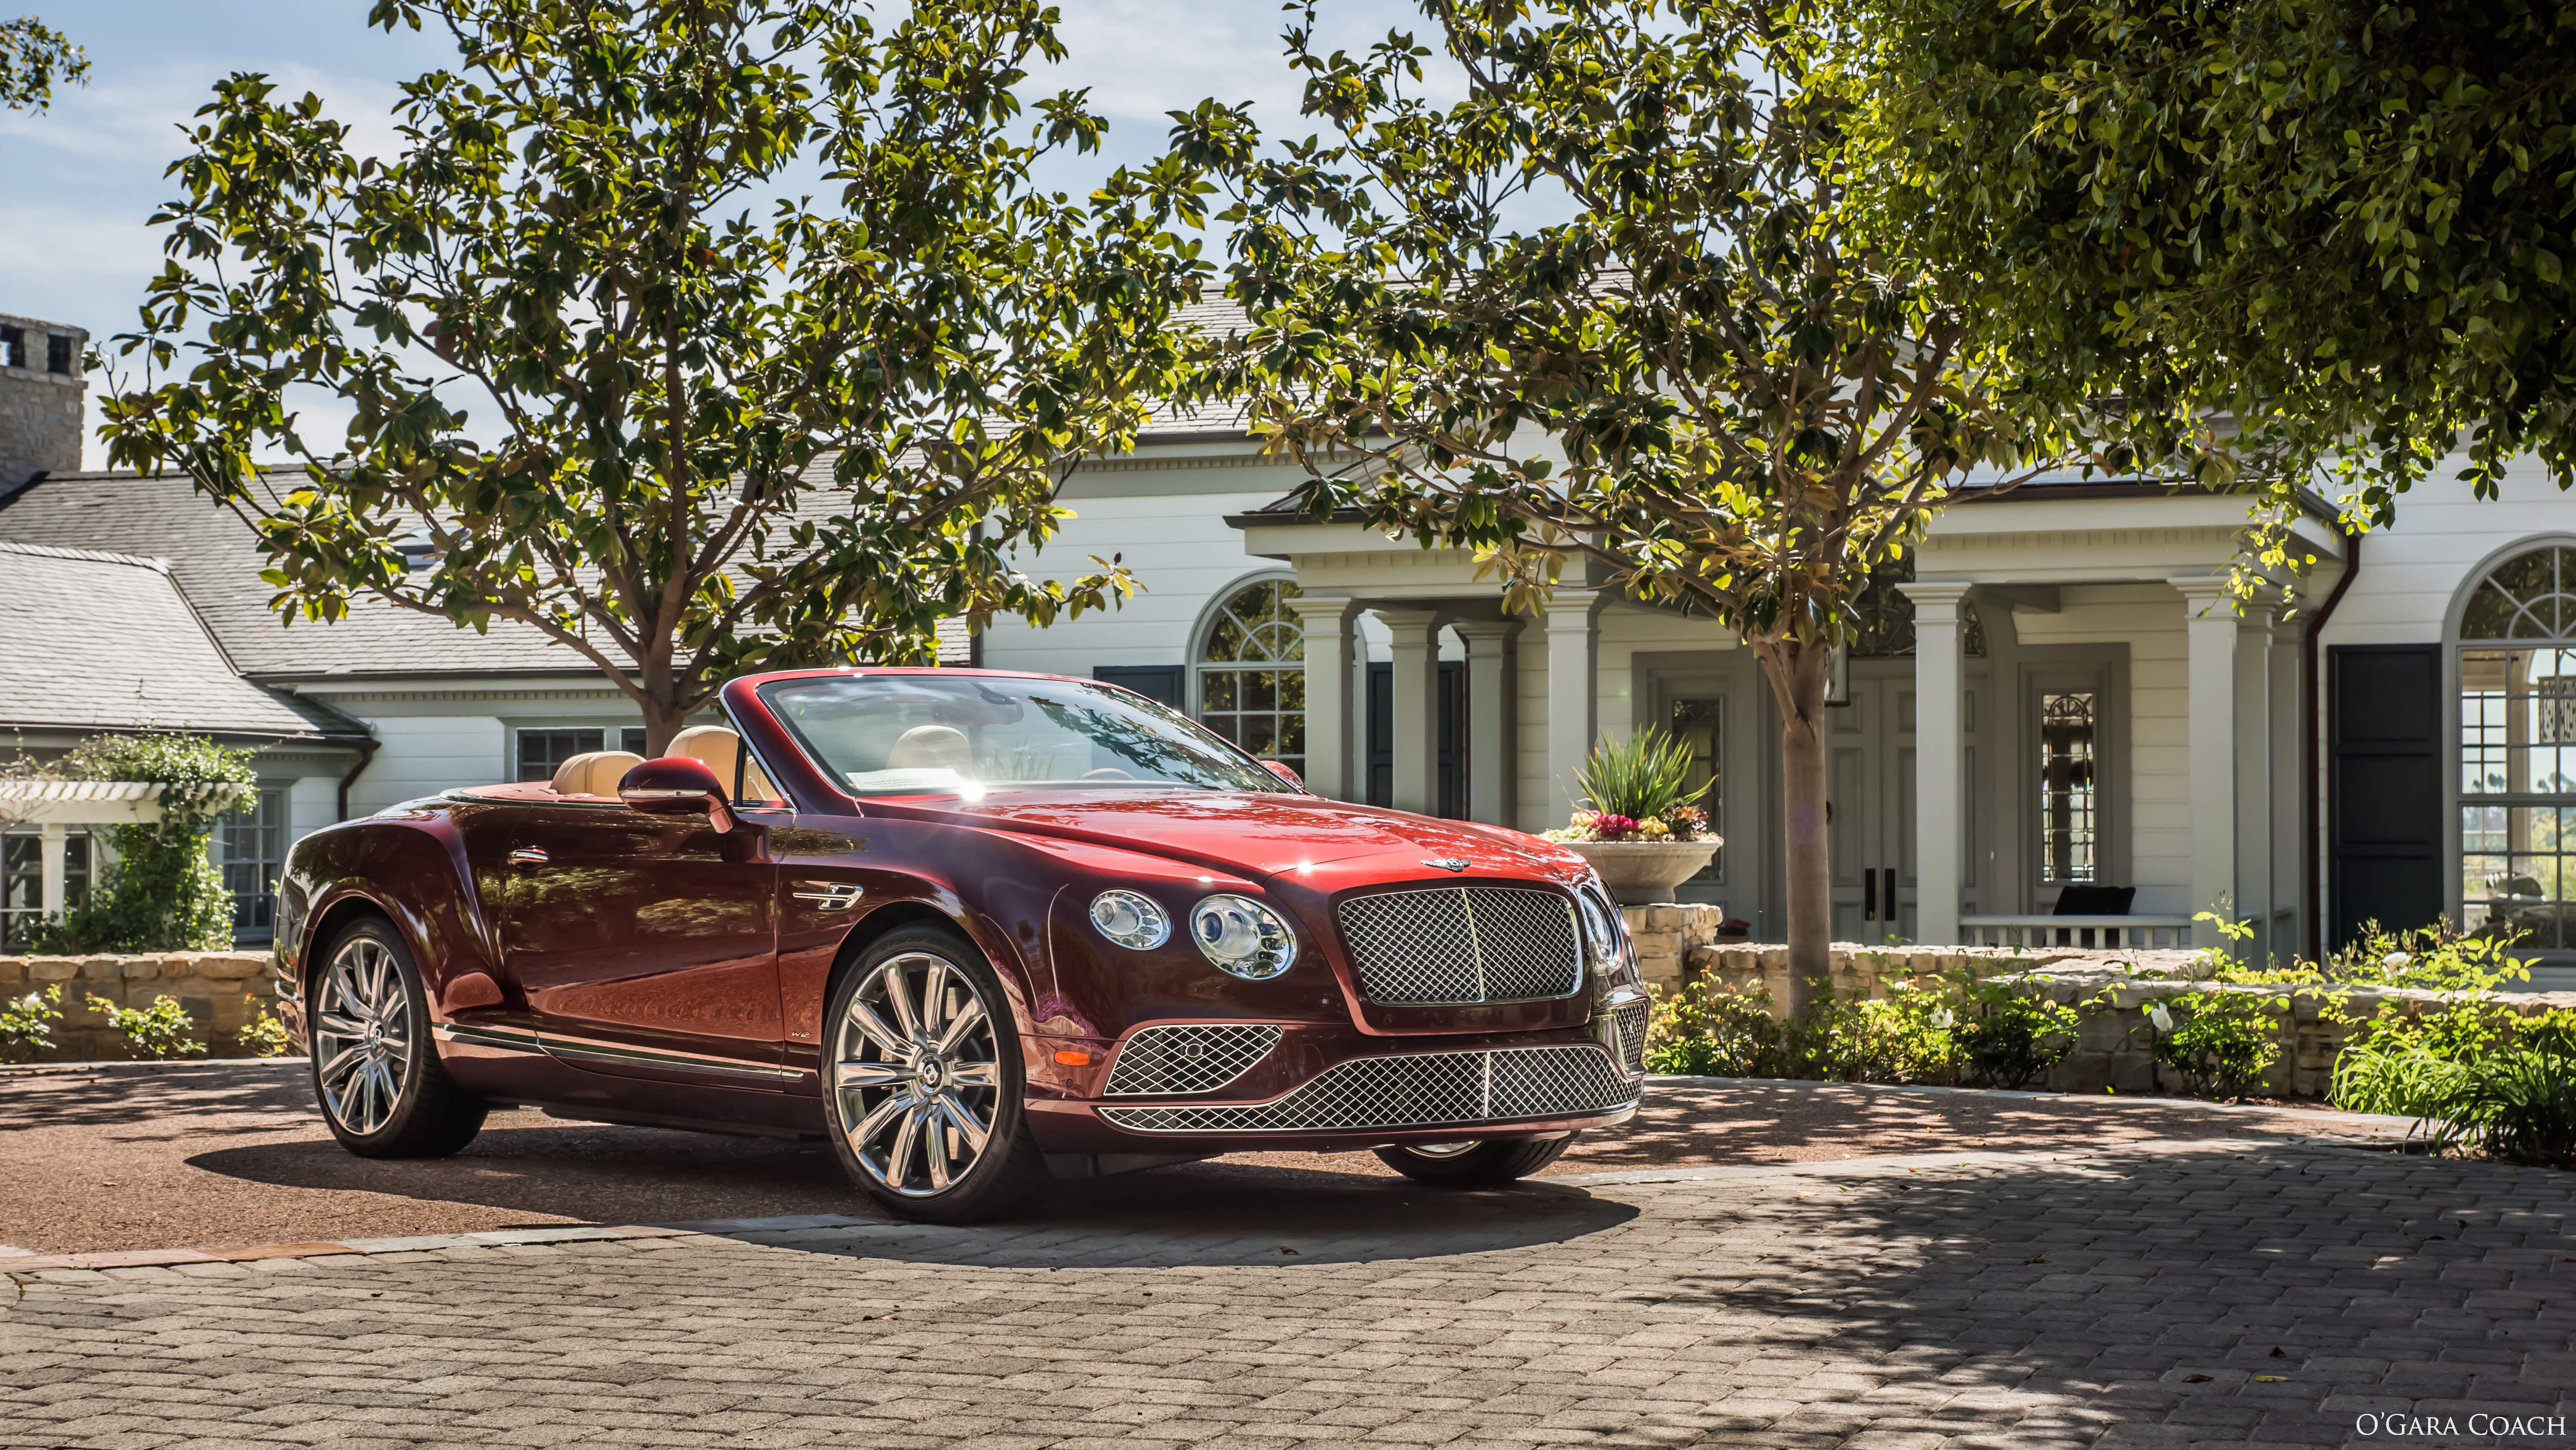 Bentley ROlls Royce Rancho Santa Fe-Partnership with San Diego Luxury Real Estate Agent Janet Lawless Christ-Ogara Group La Jolla-12